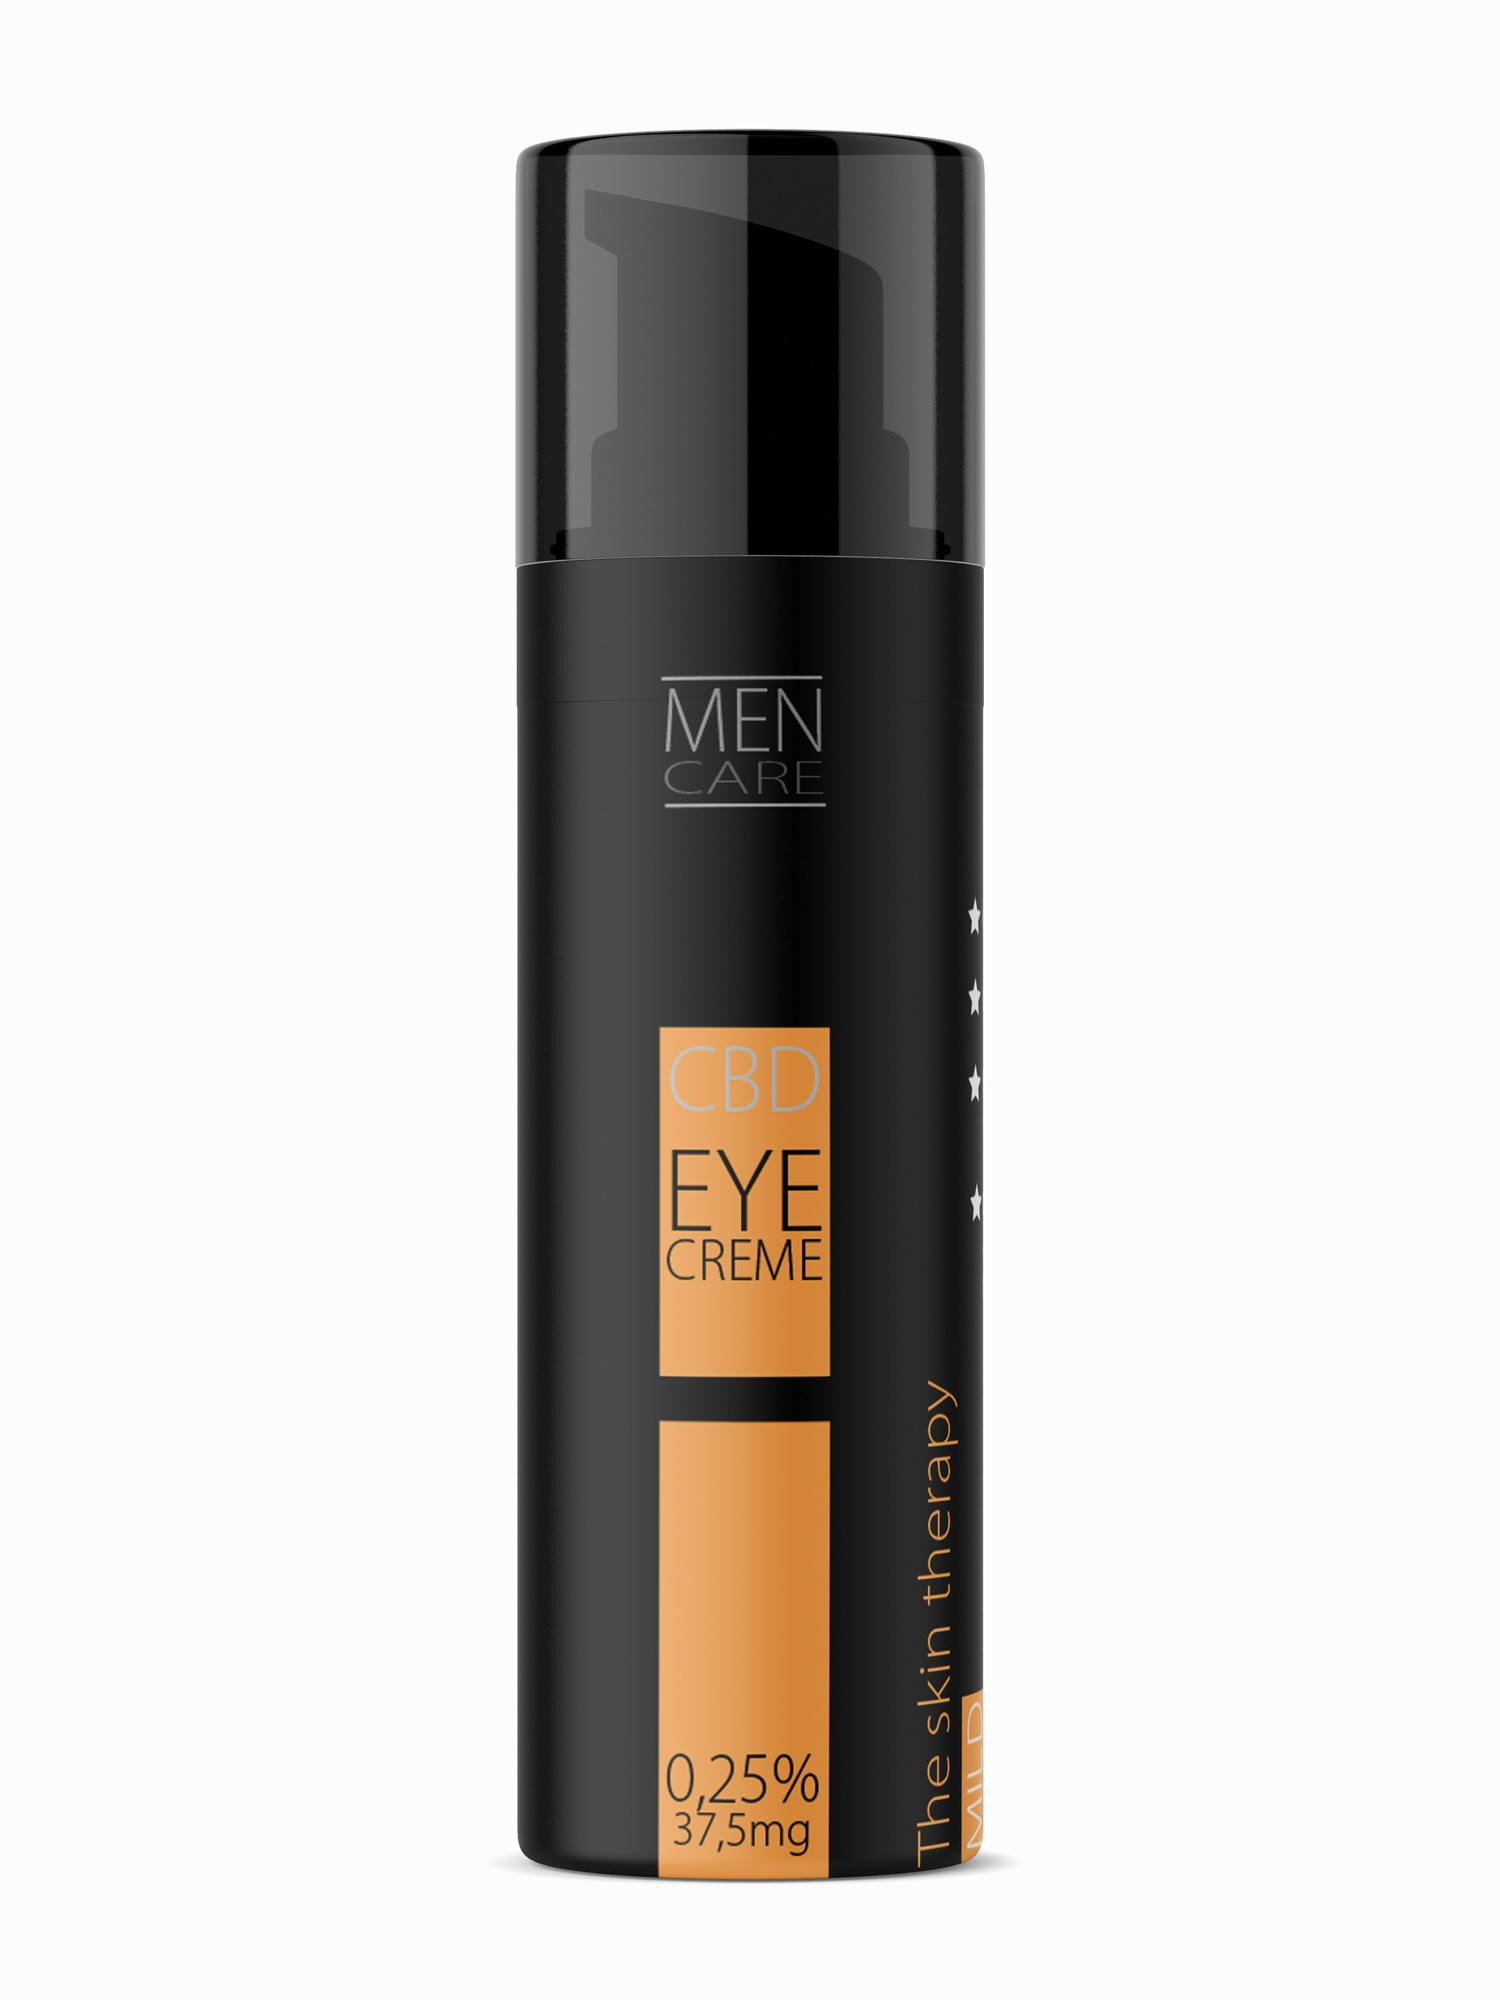 Men Care CBD Augenpflegelotion / 30ml 0,25% CBD + Hyaluron & Aminosäuren